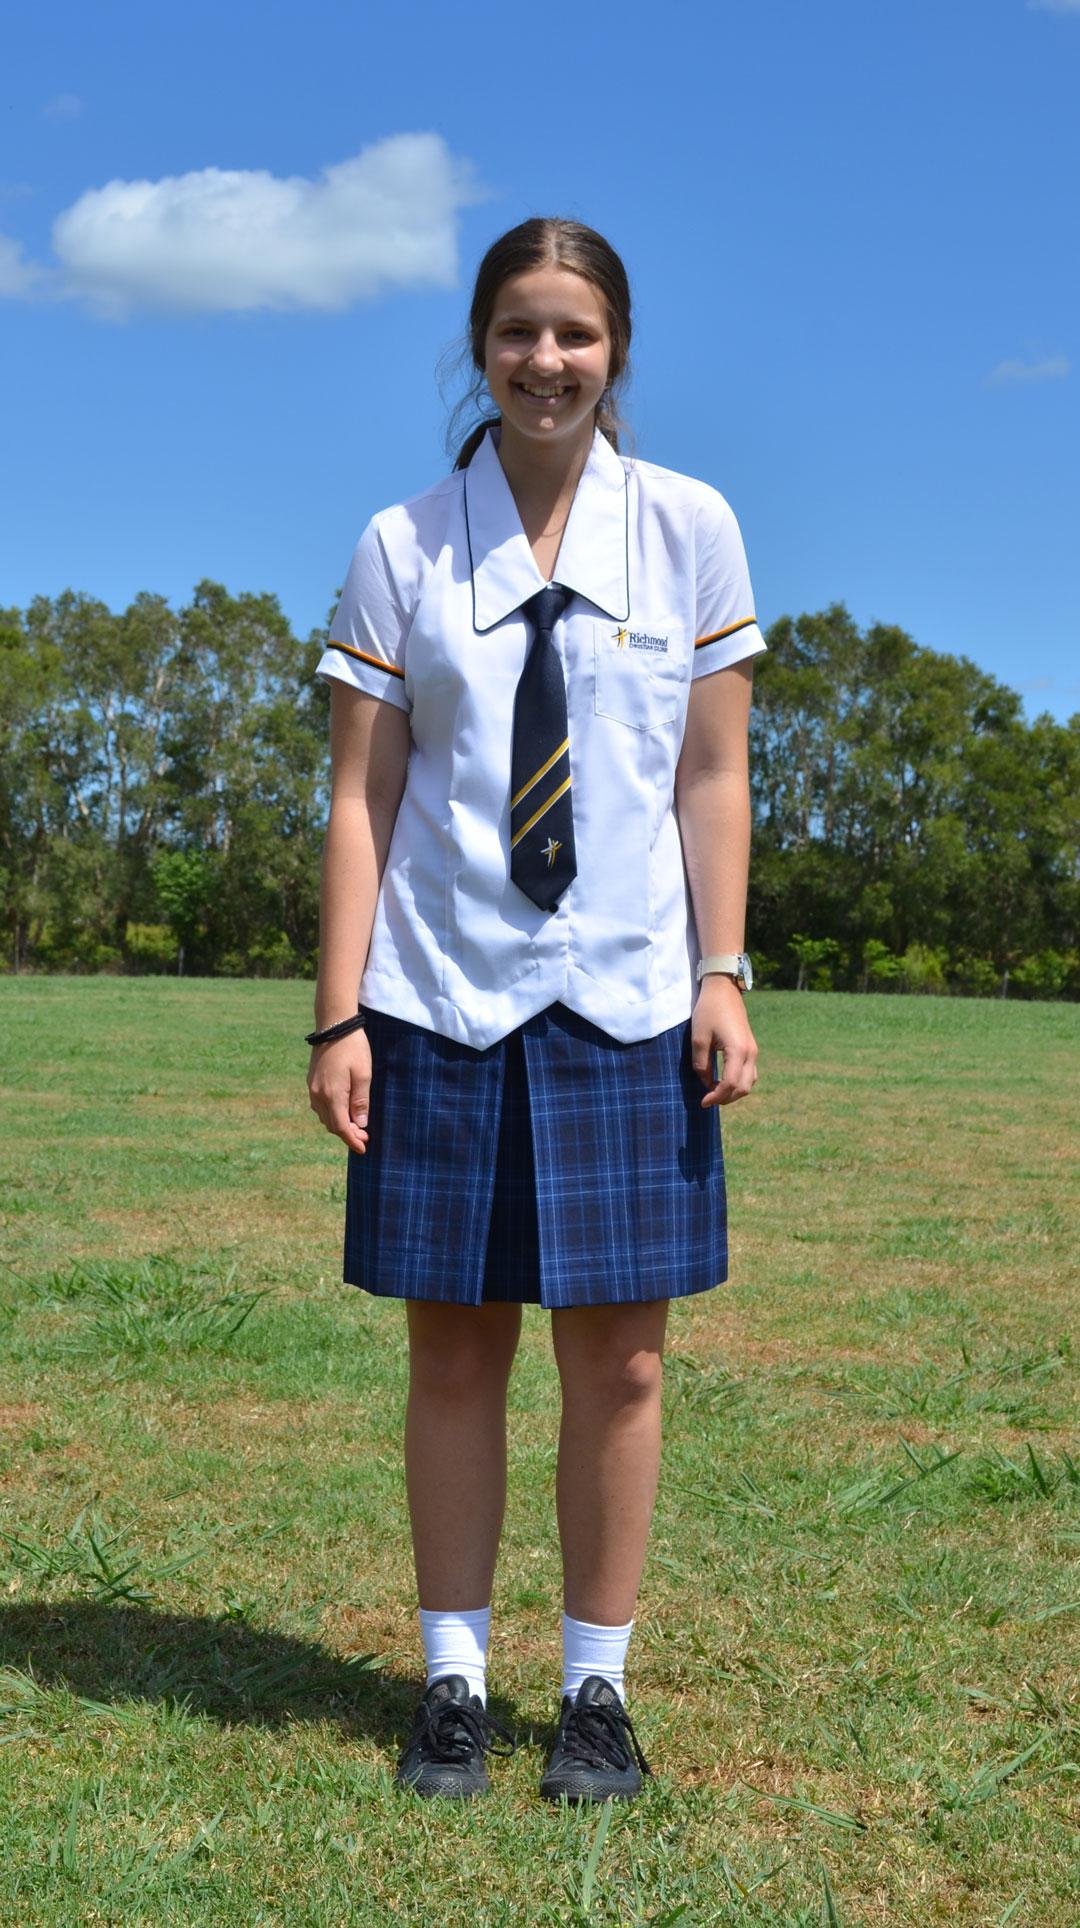 seniorgirluniform